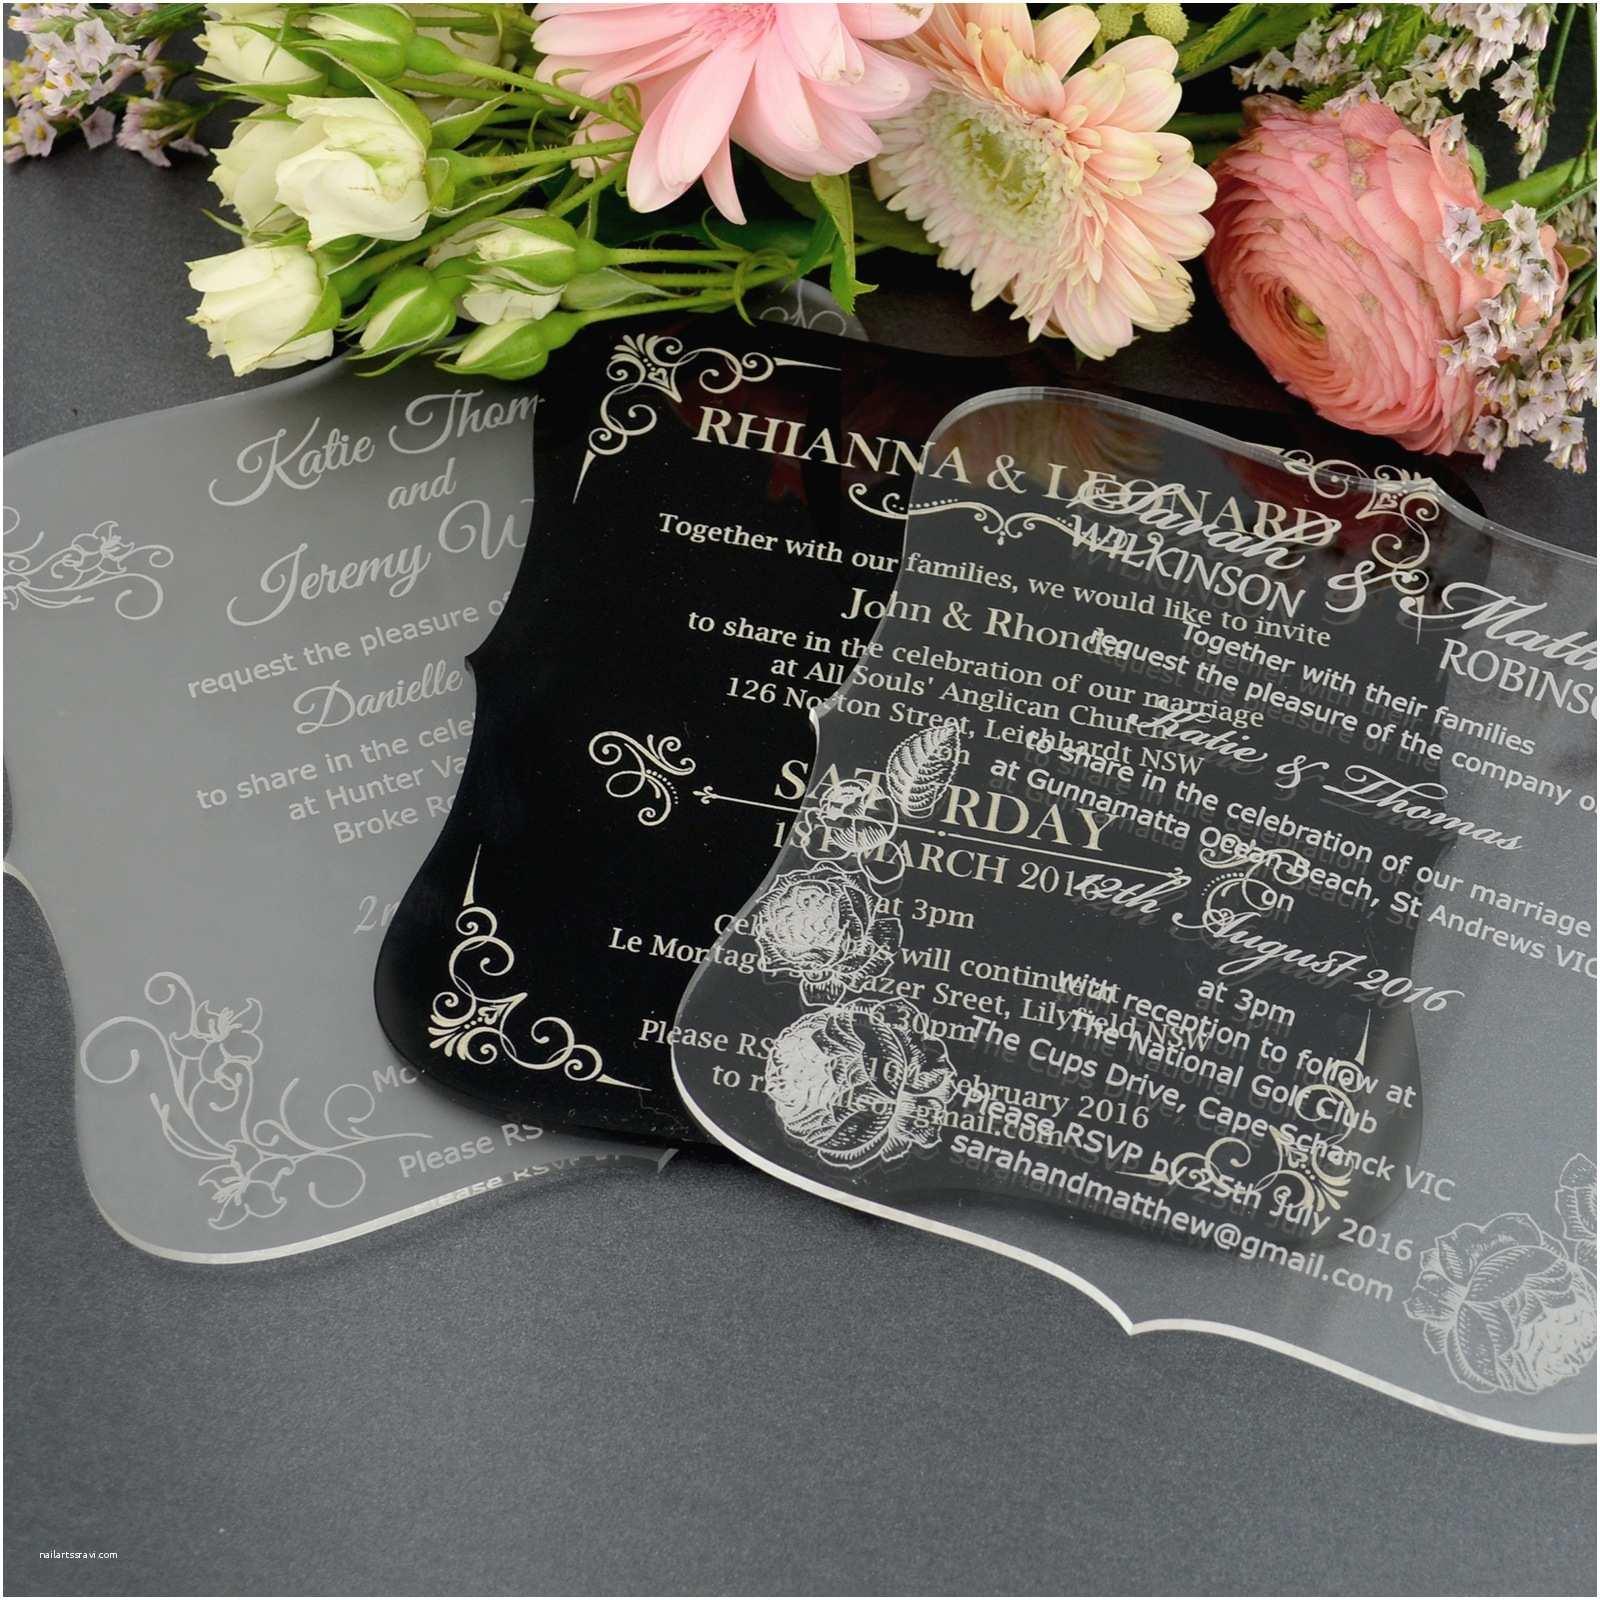 Engraved Wedding Invitations C6 Engraved Acrylic Wedding Invitations with Rounded Edges